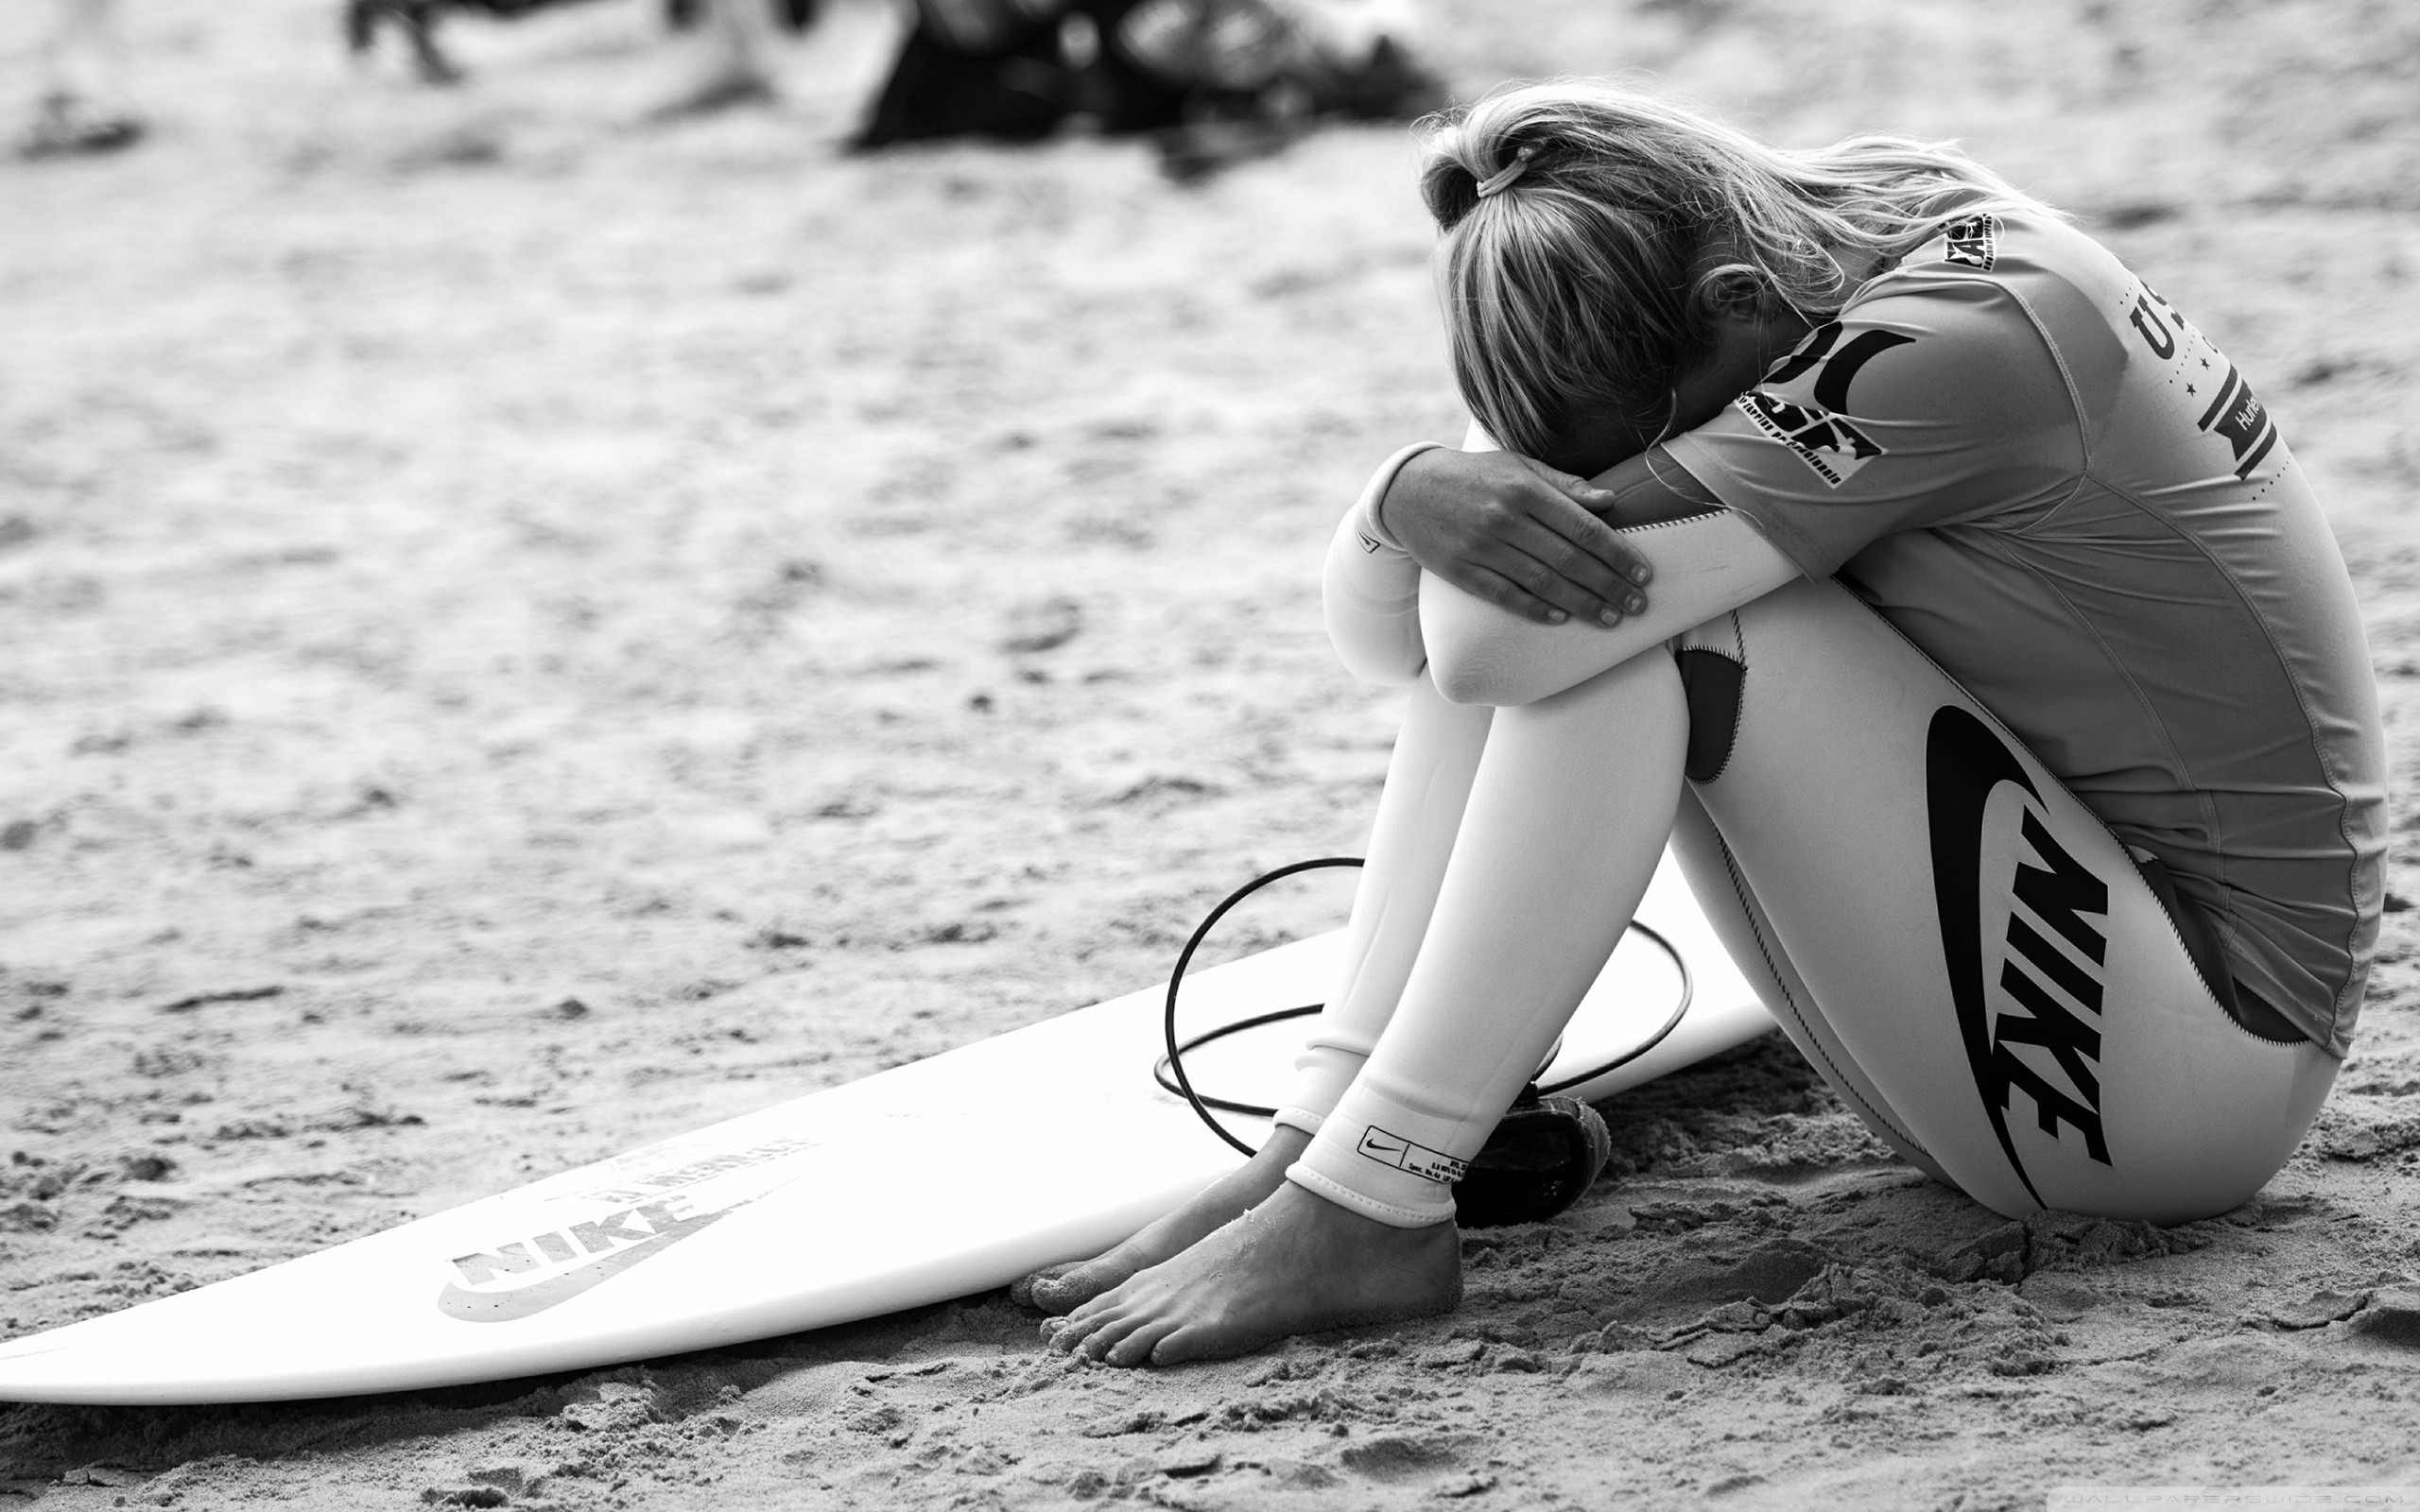 Surfer HD Wide Wallpaper for Widescreen